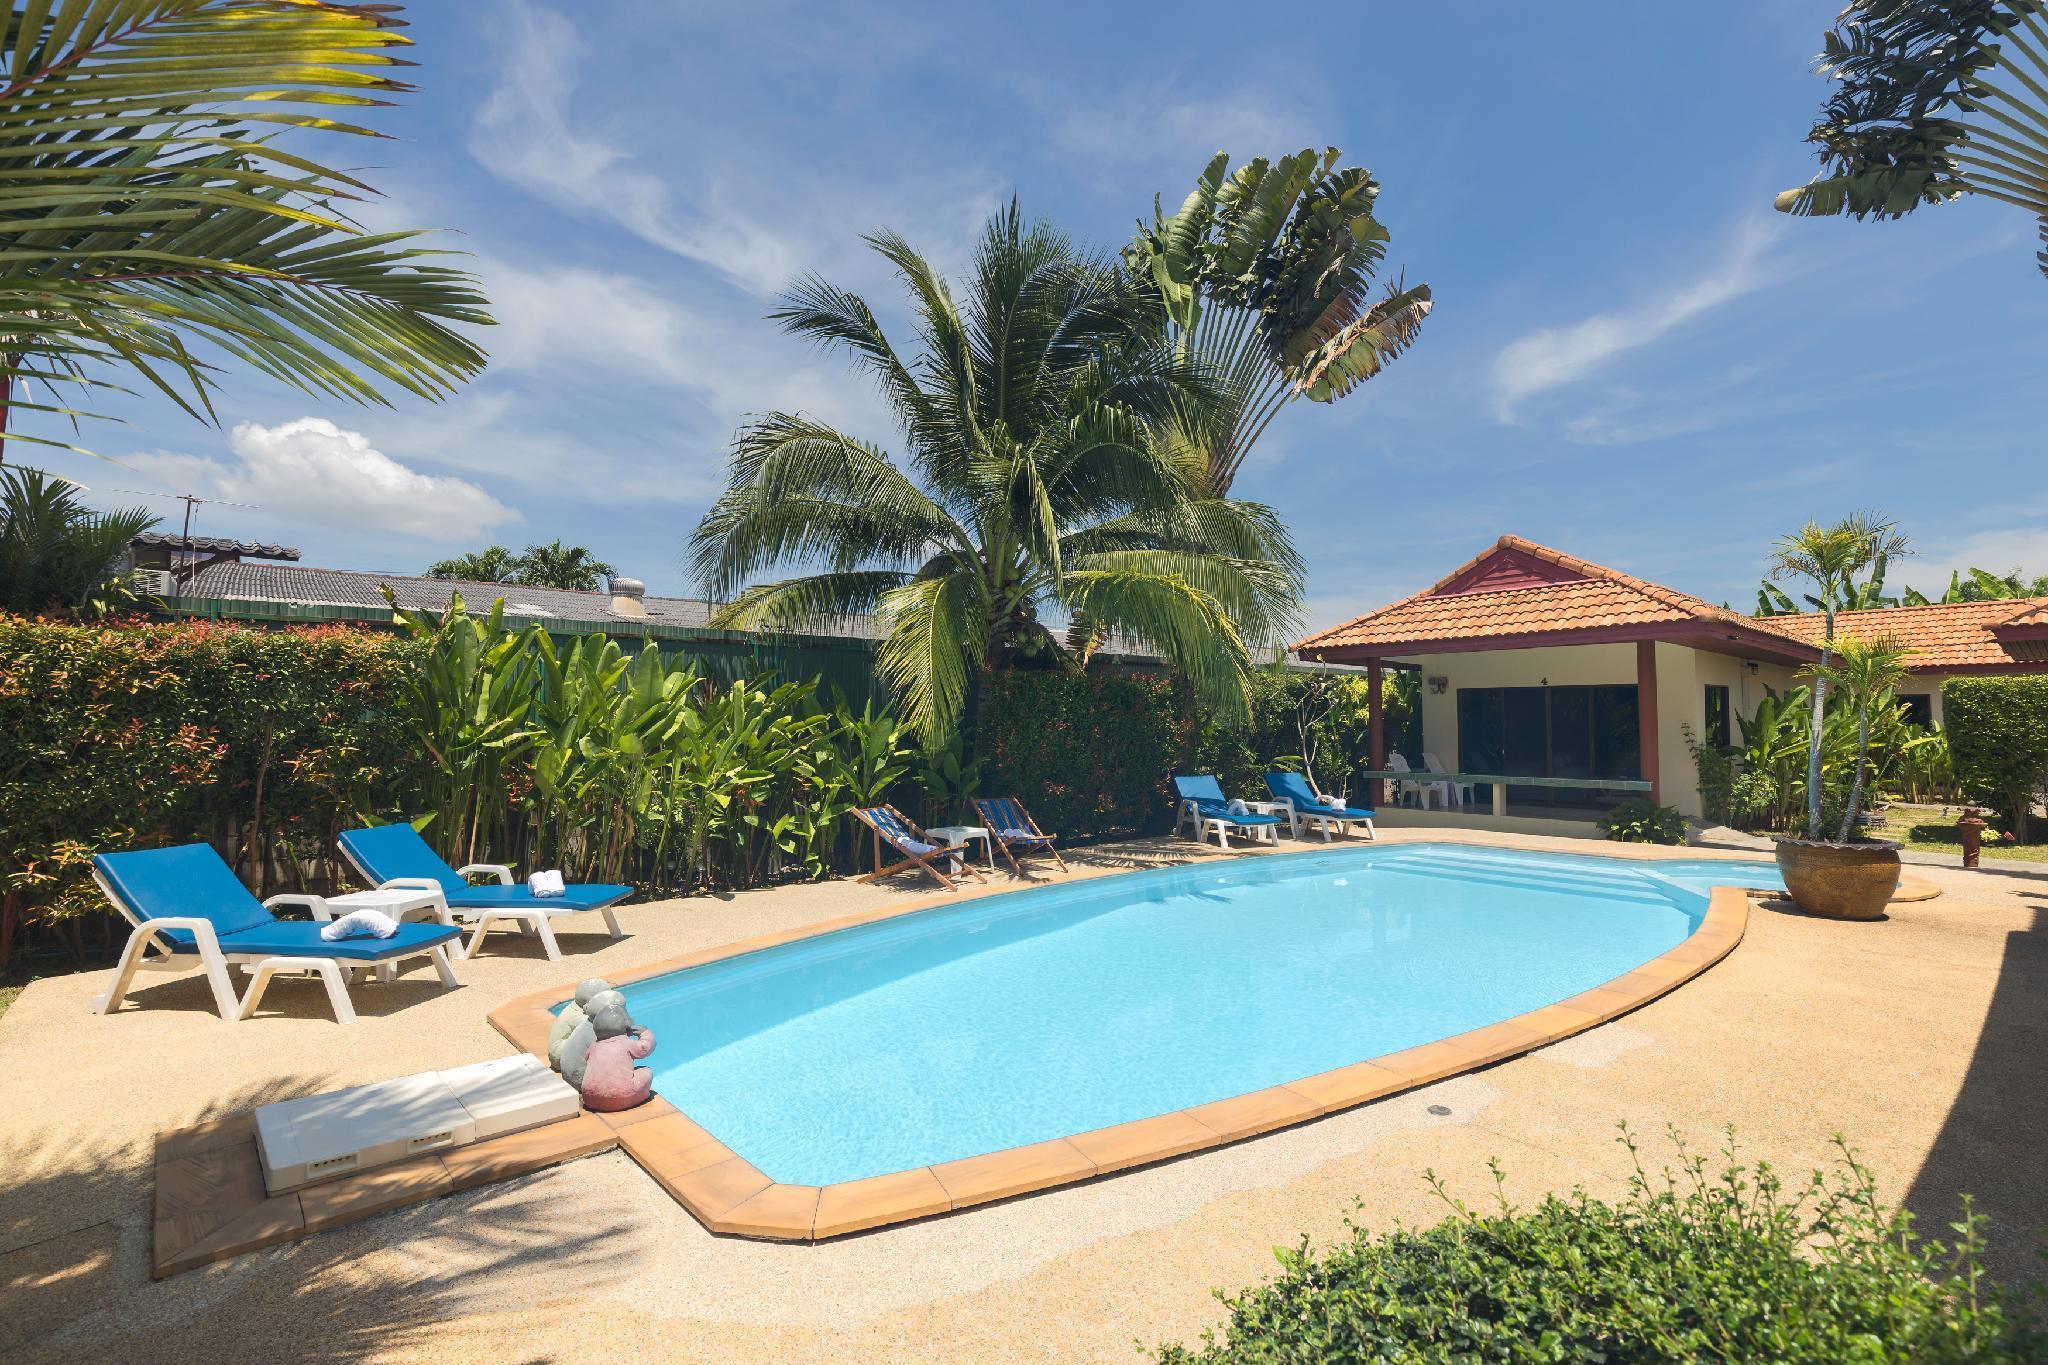 Sansuko Ville Bungalow Resort แสนสุโข วิลล์ บังกะโล รีสอร์ท